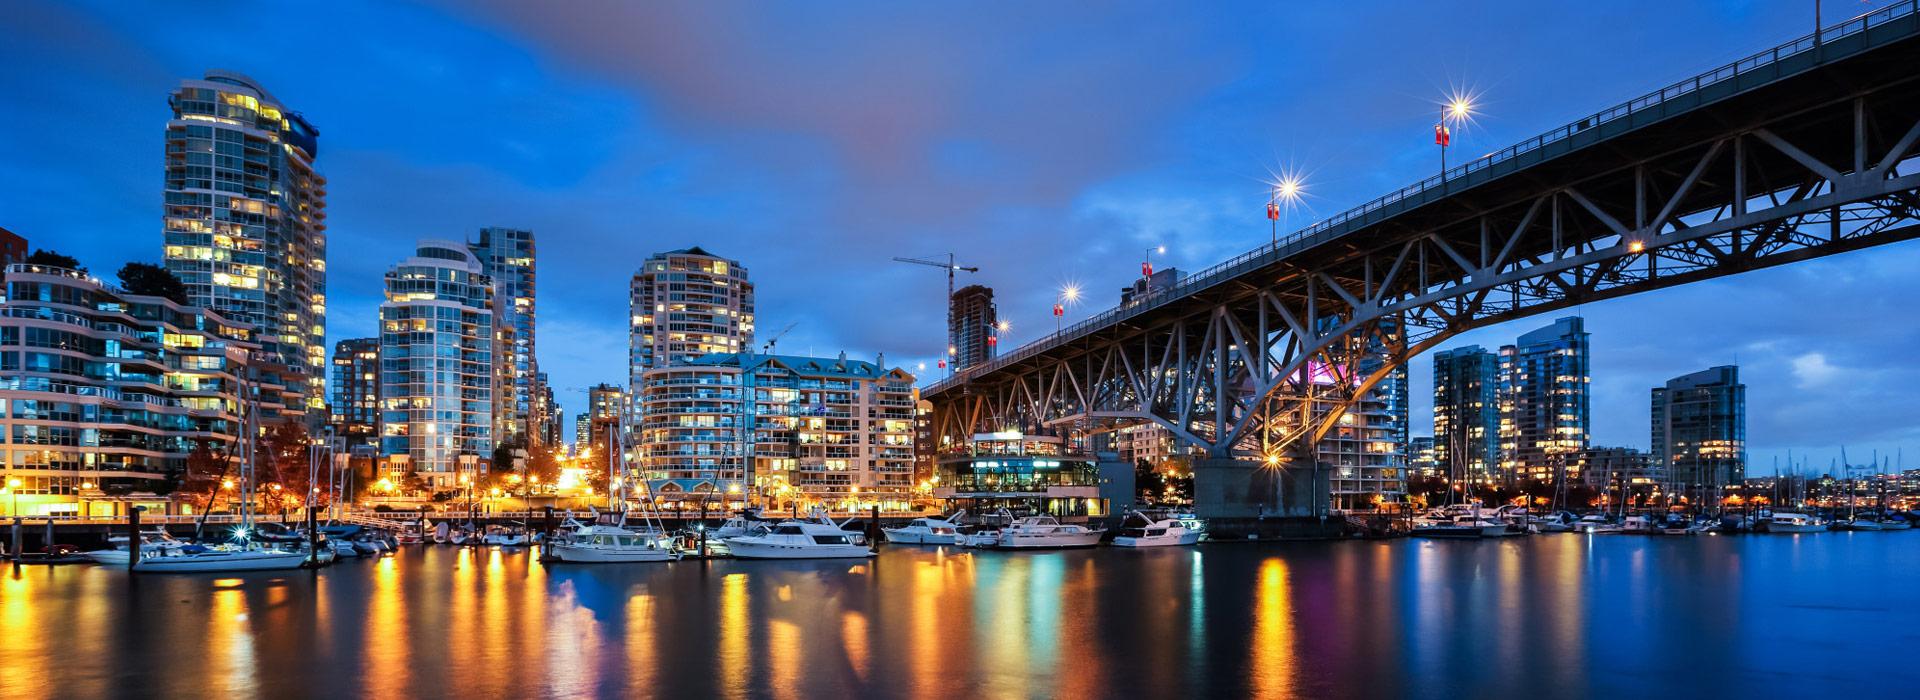 SliderWebBitplay_Vancouver